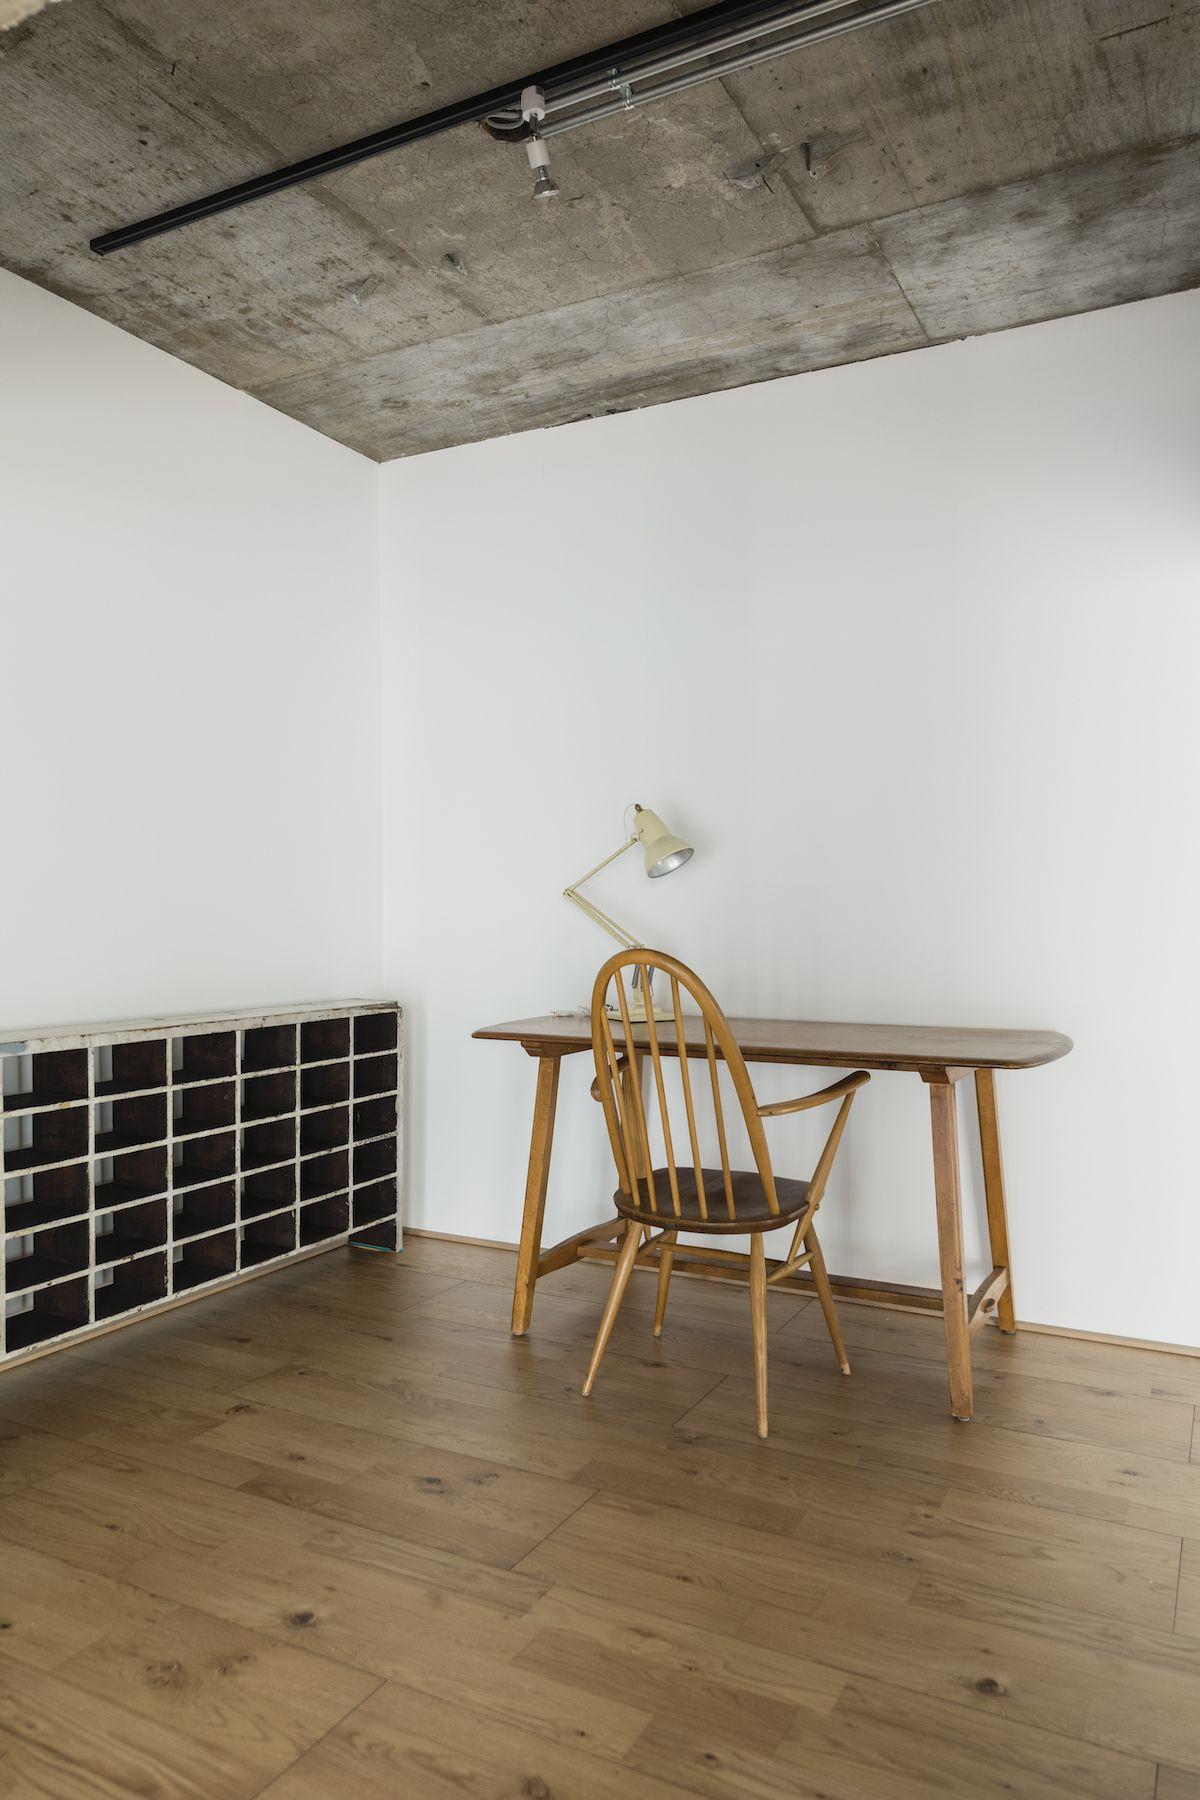 Studio YOKOSHIRO  (スタジオ ヨコシロ)ヴィンテージ家具